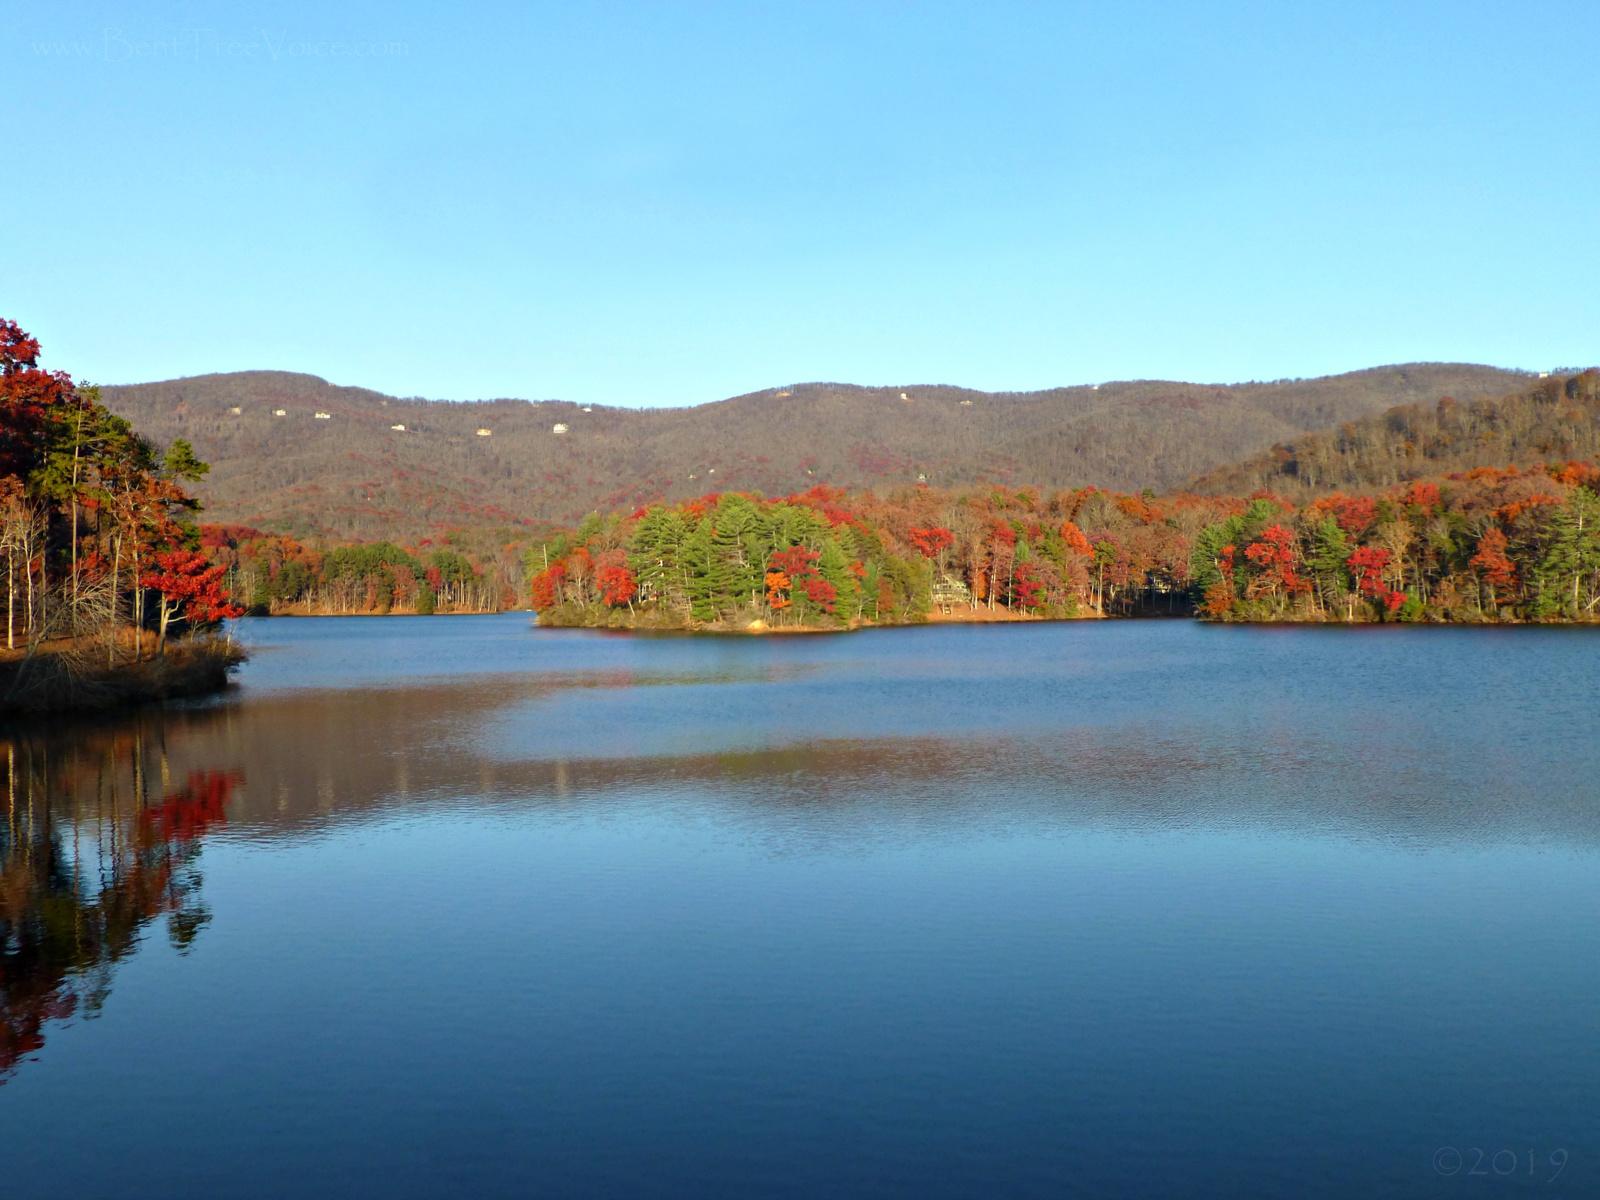 November 24, 2019 - view of Lake Tamarack from the dam